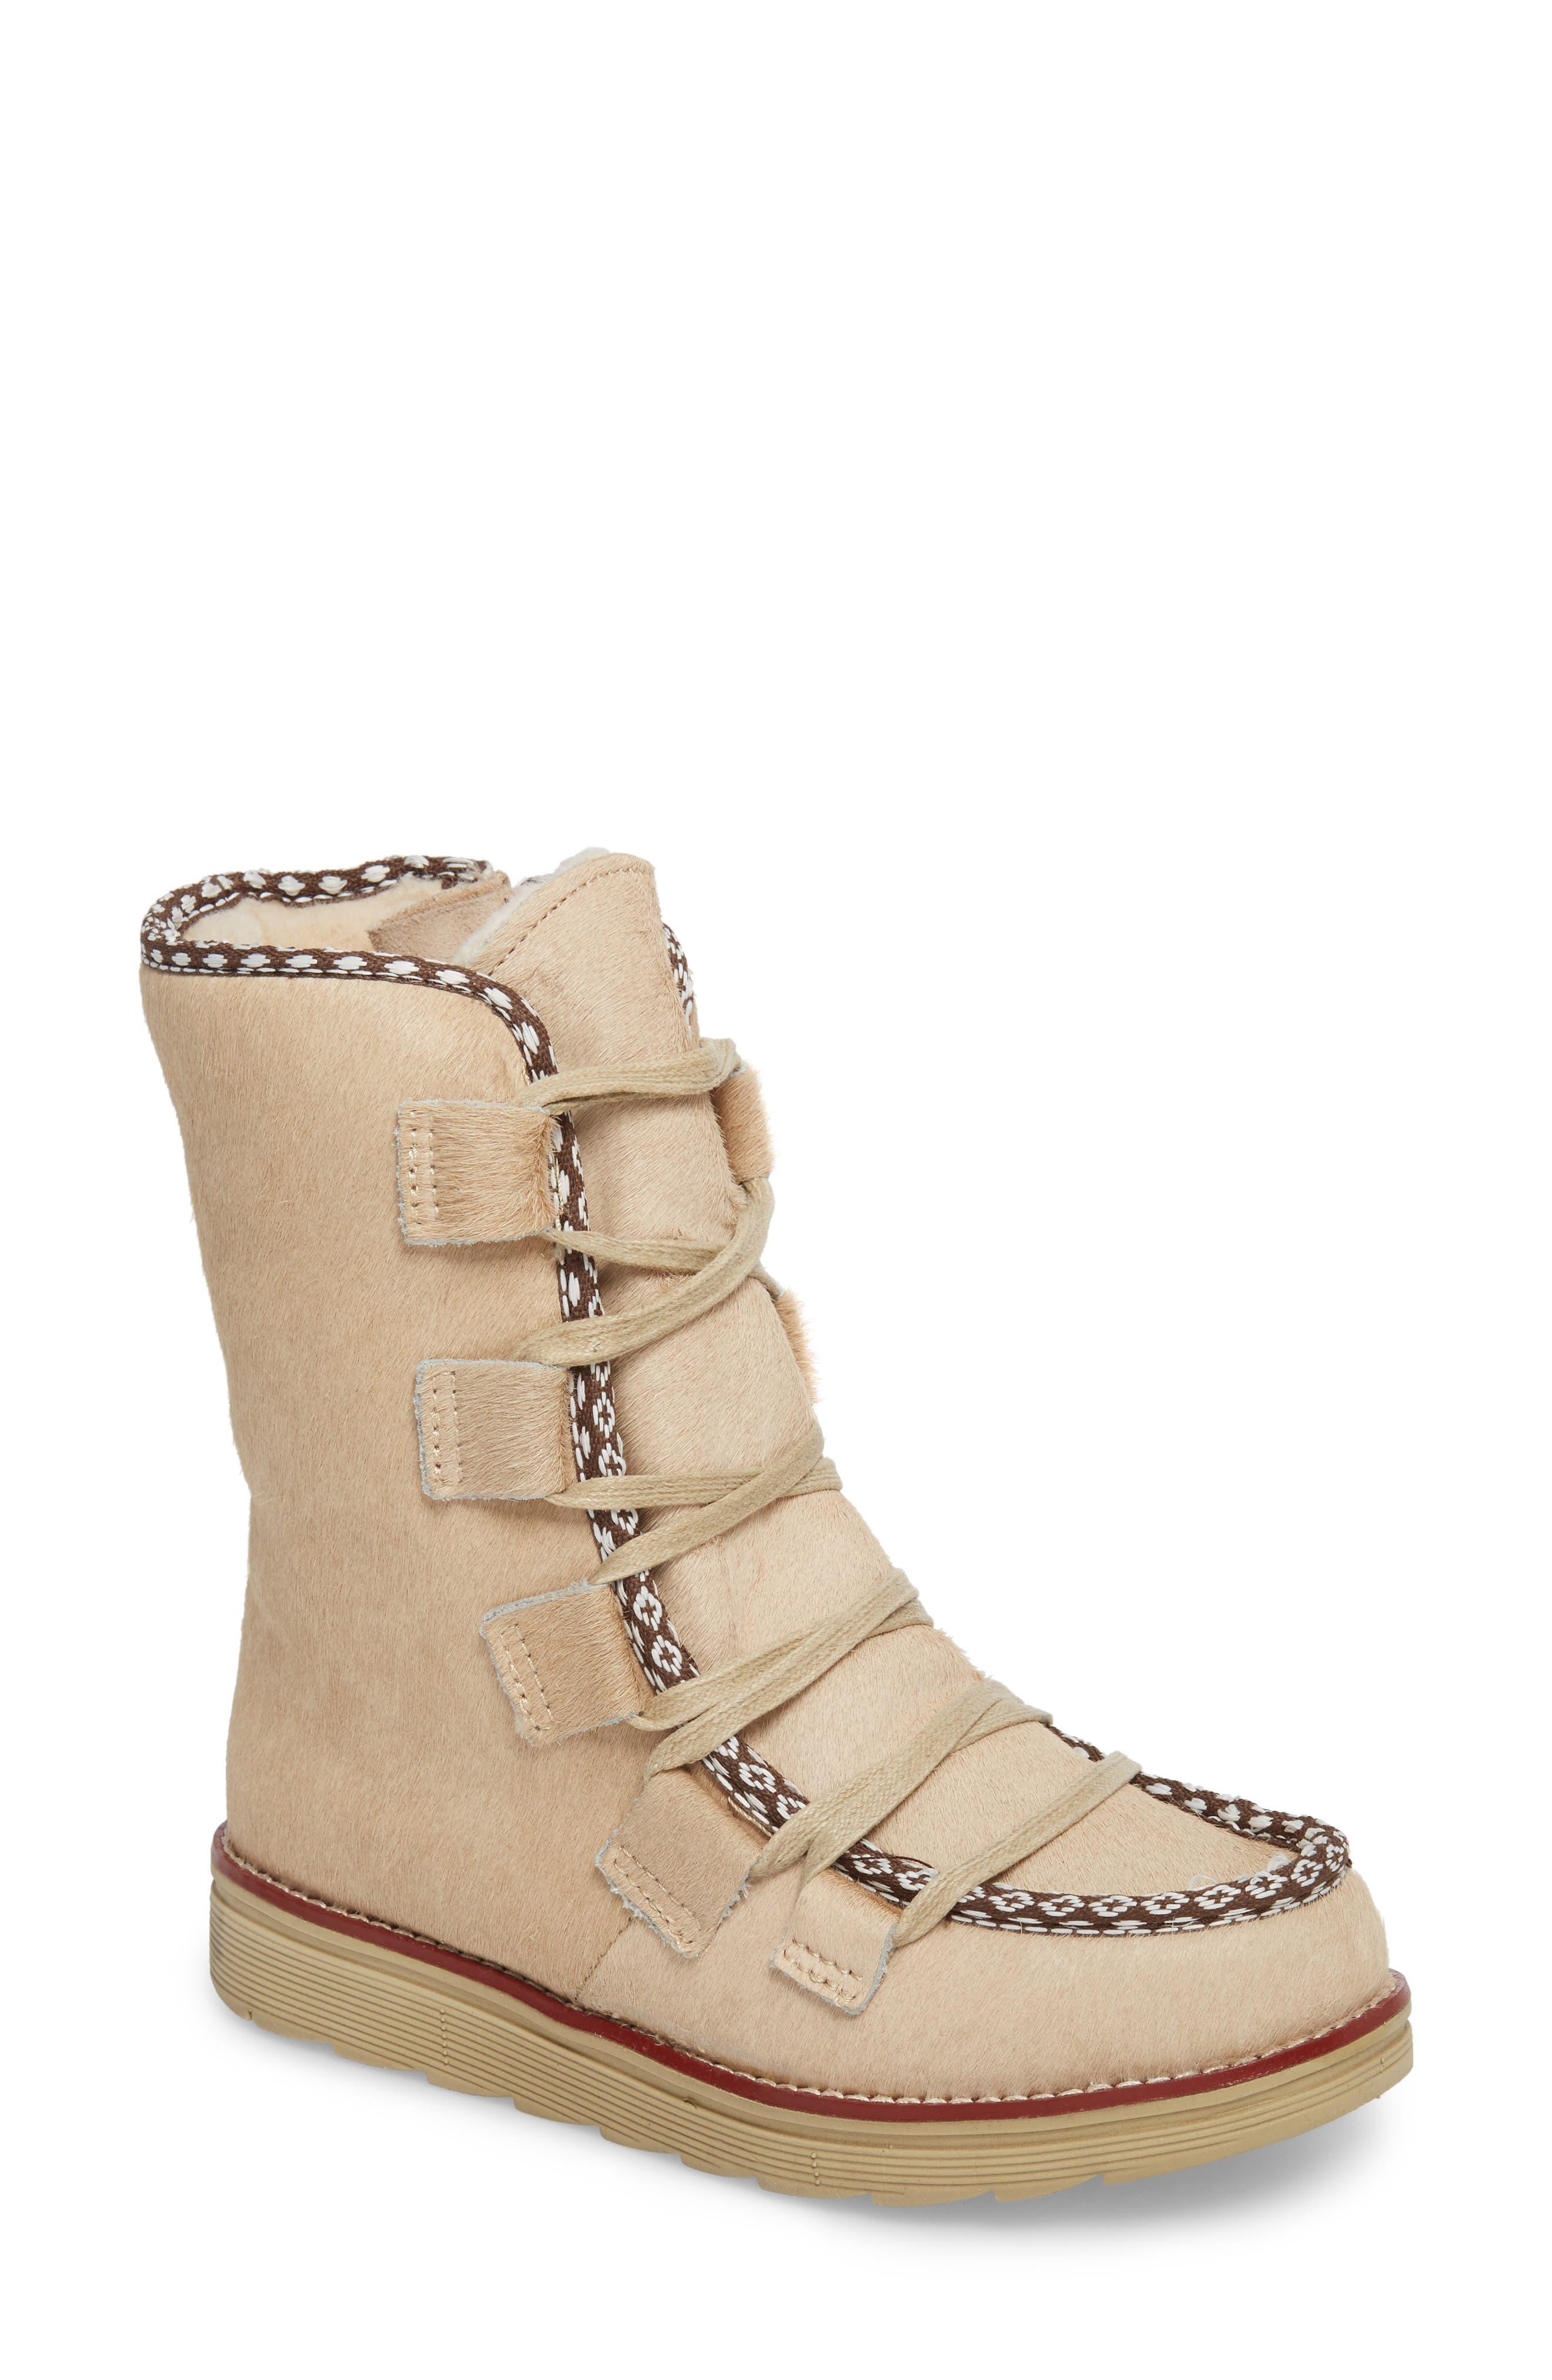 Main Image - Royal Canadian Kitchener Waterproof Genuine Calf Hair Snow Boot (Women)